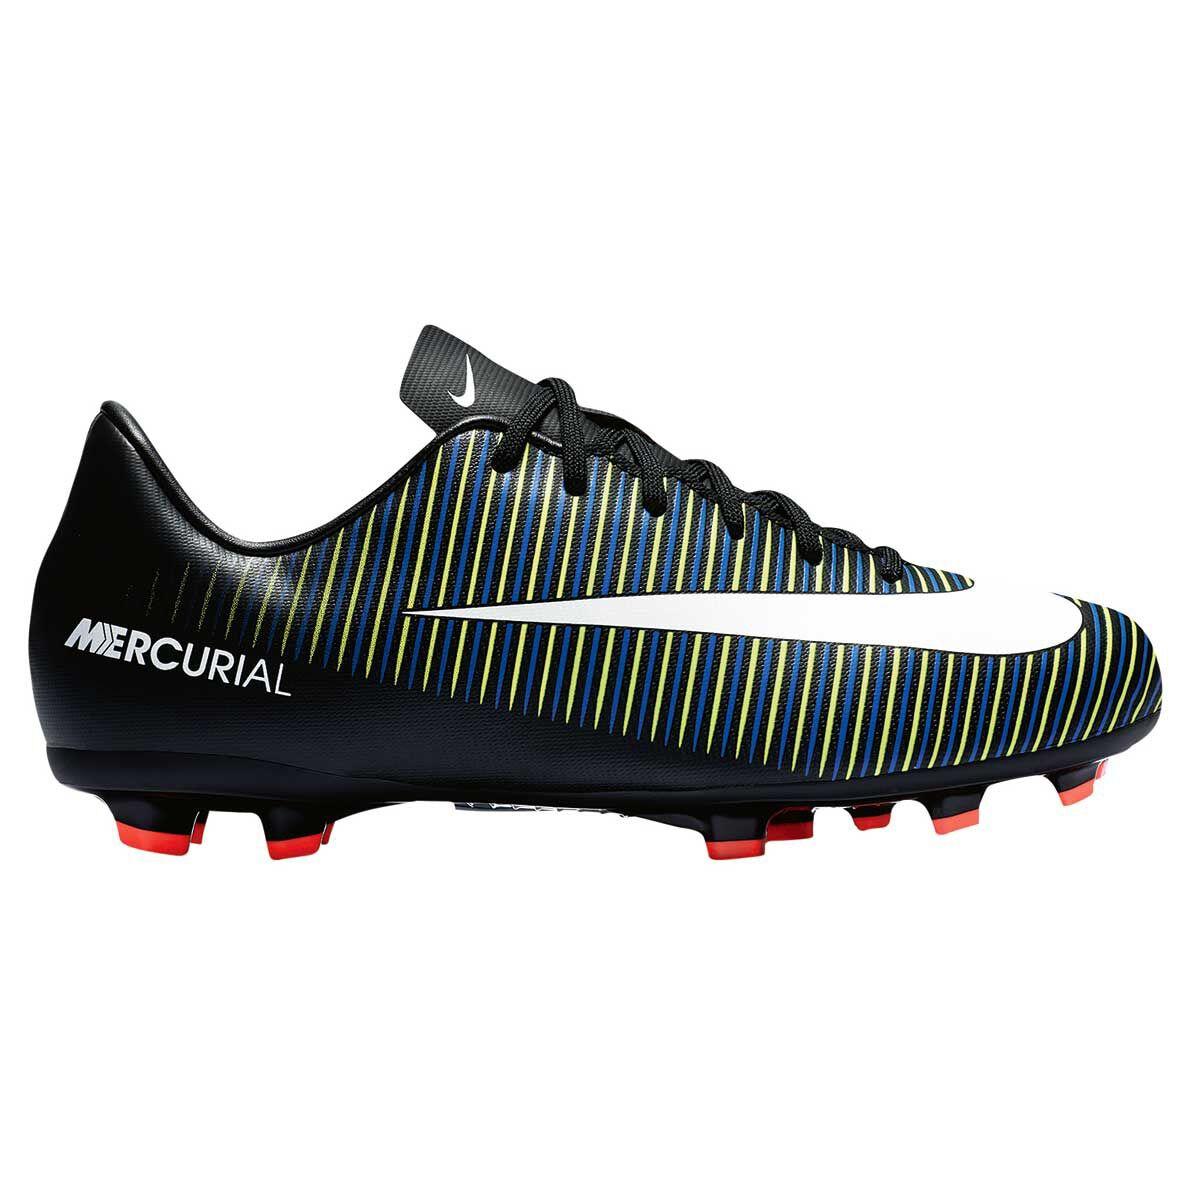 8eaeace4d ... germany nike mercurial victory vi junior football boots black white us  3 junior black c8df4 1a615 ...